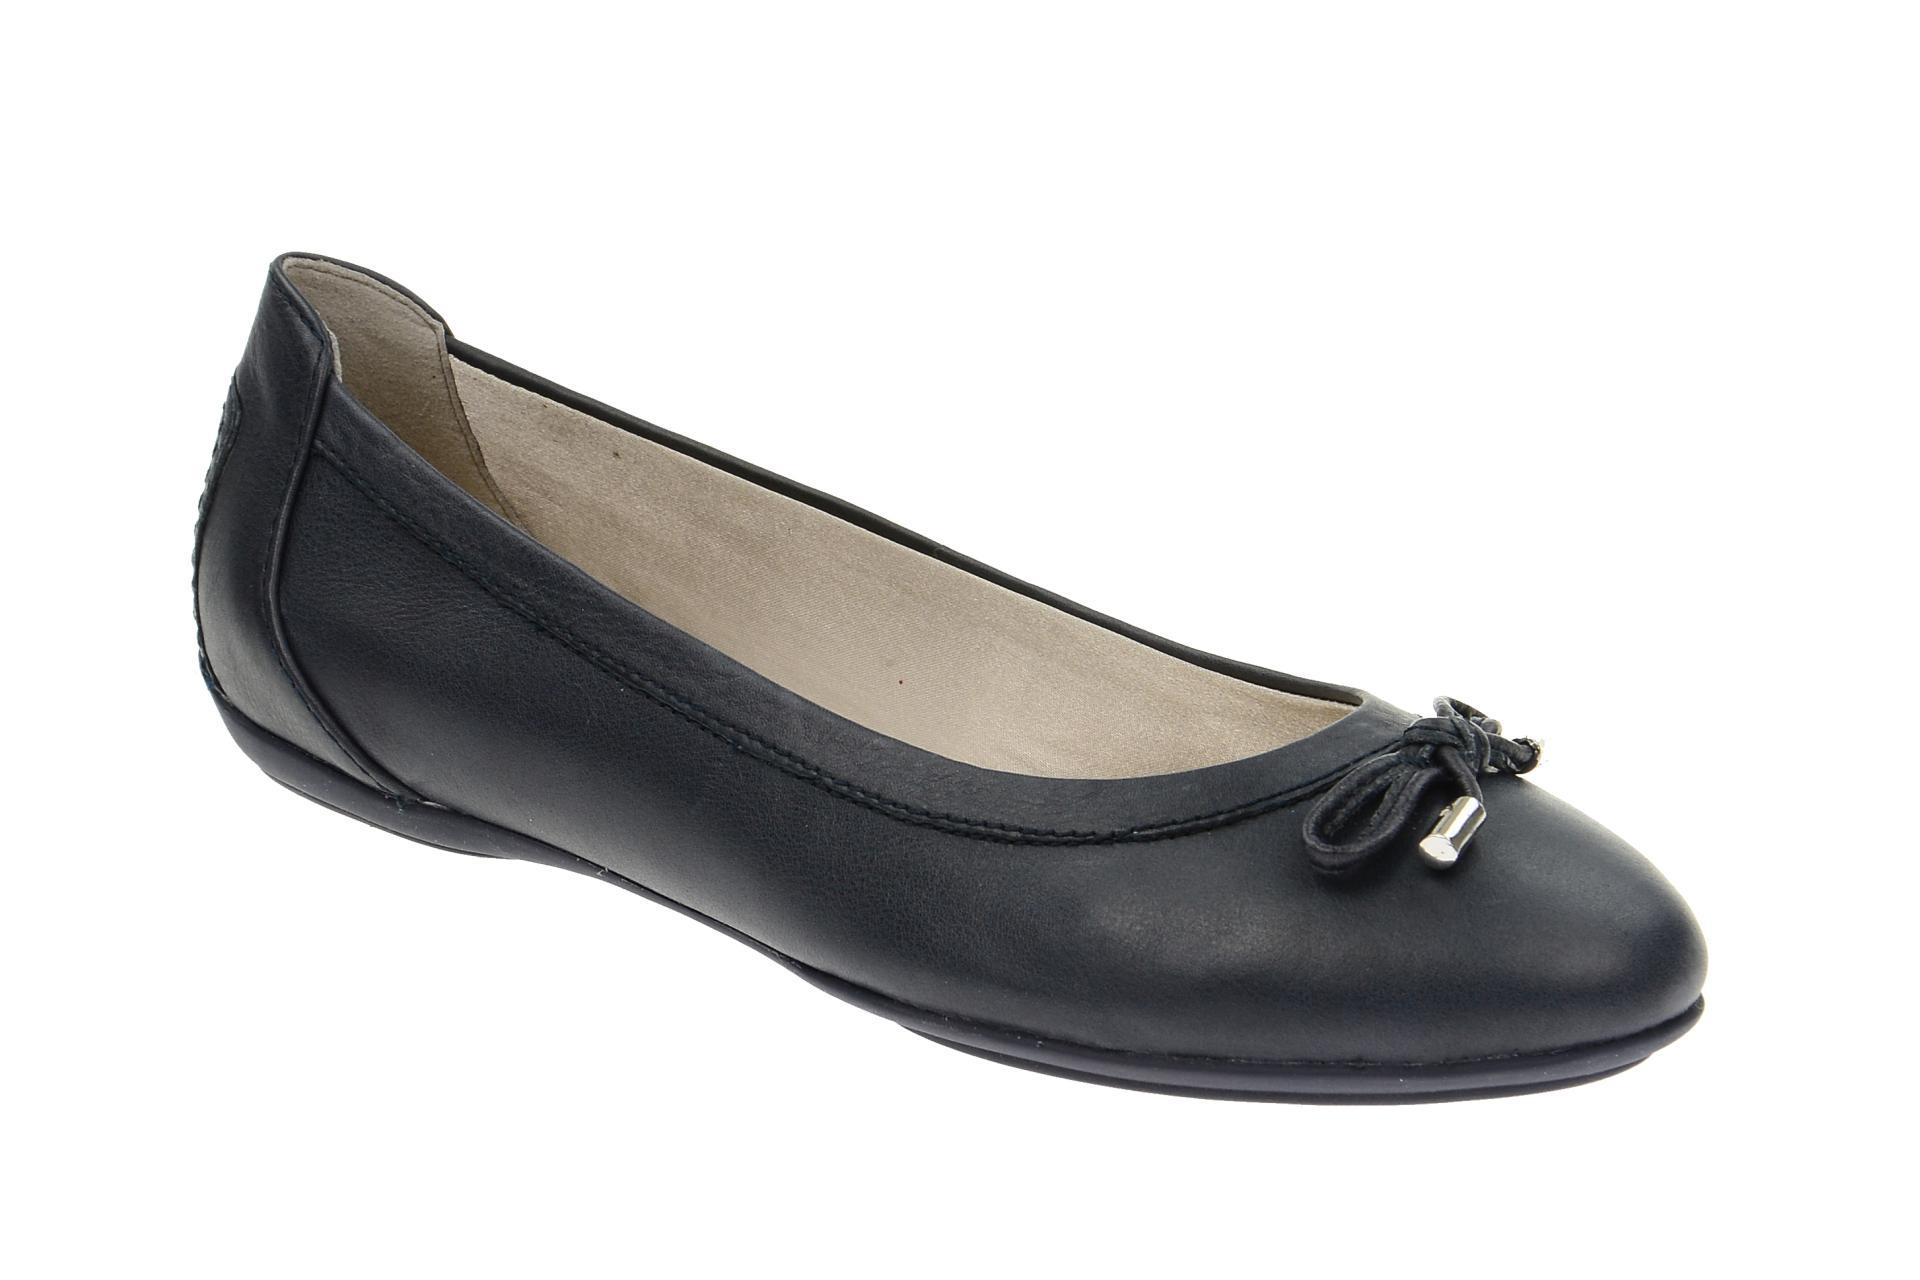 Details zu Geox Schuhe CHARLENE blau Ballerinas Damen Halbschuhe D32Y7A 00043 C4002 NEU